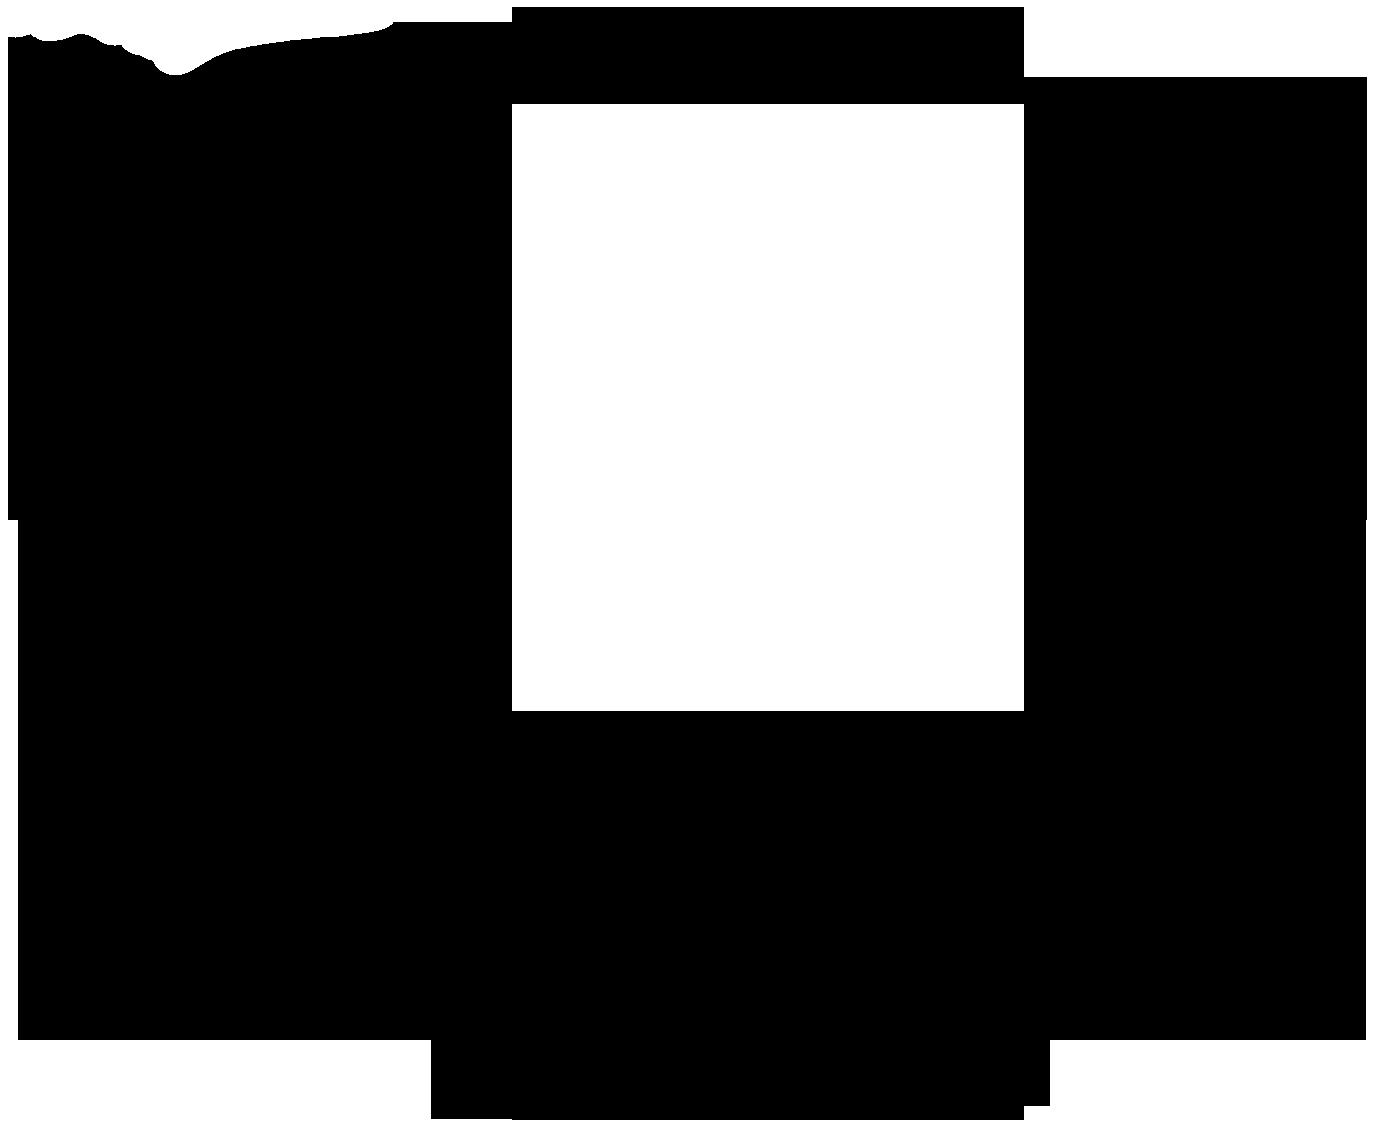 1377x1137 Cupcake Black And White Cupcake Clipart Black And White Free